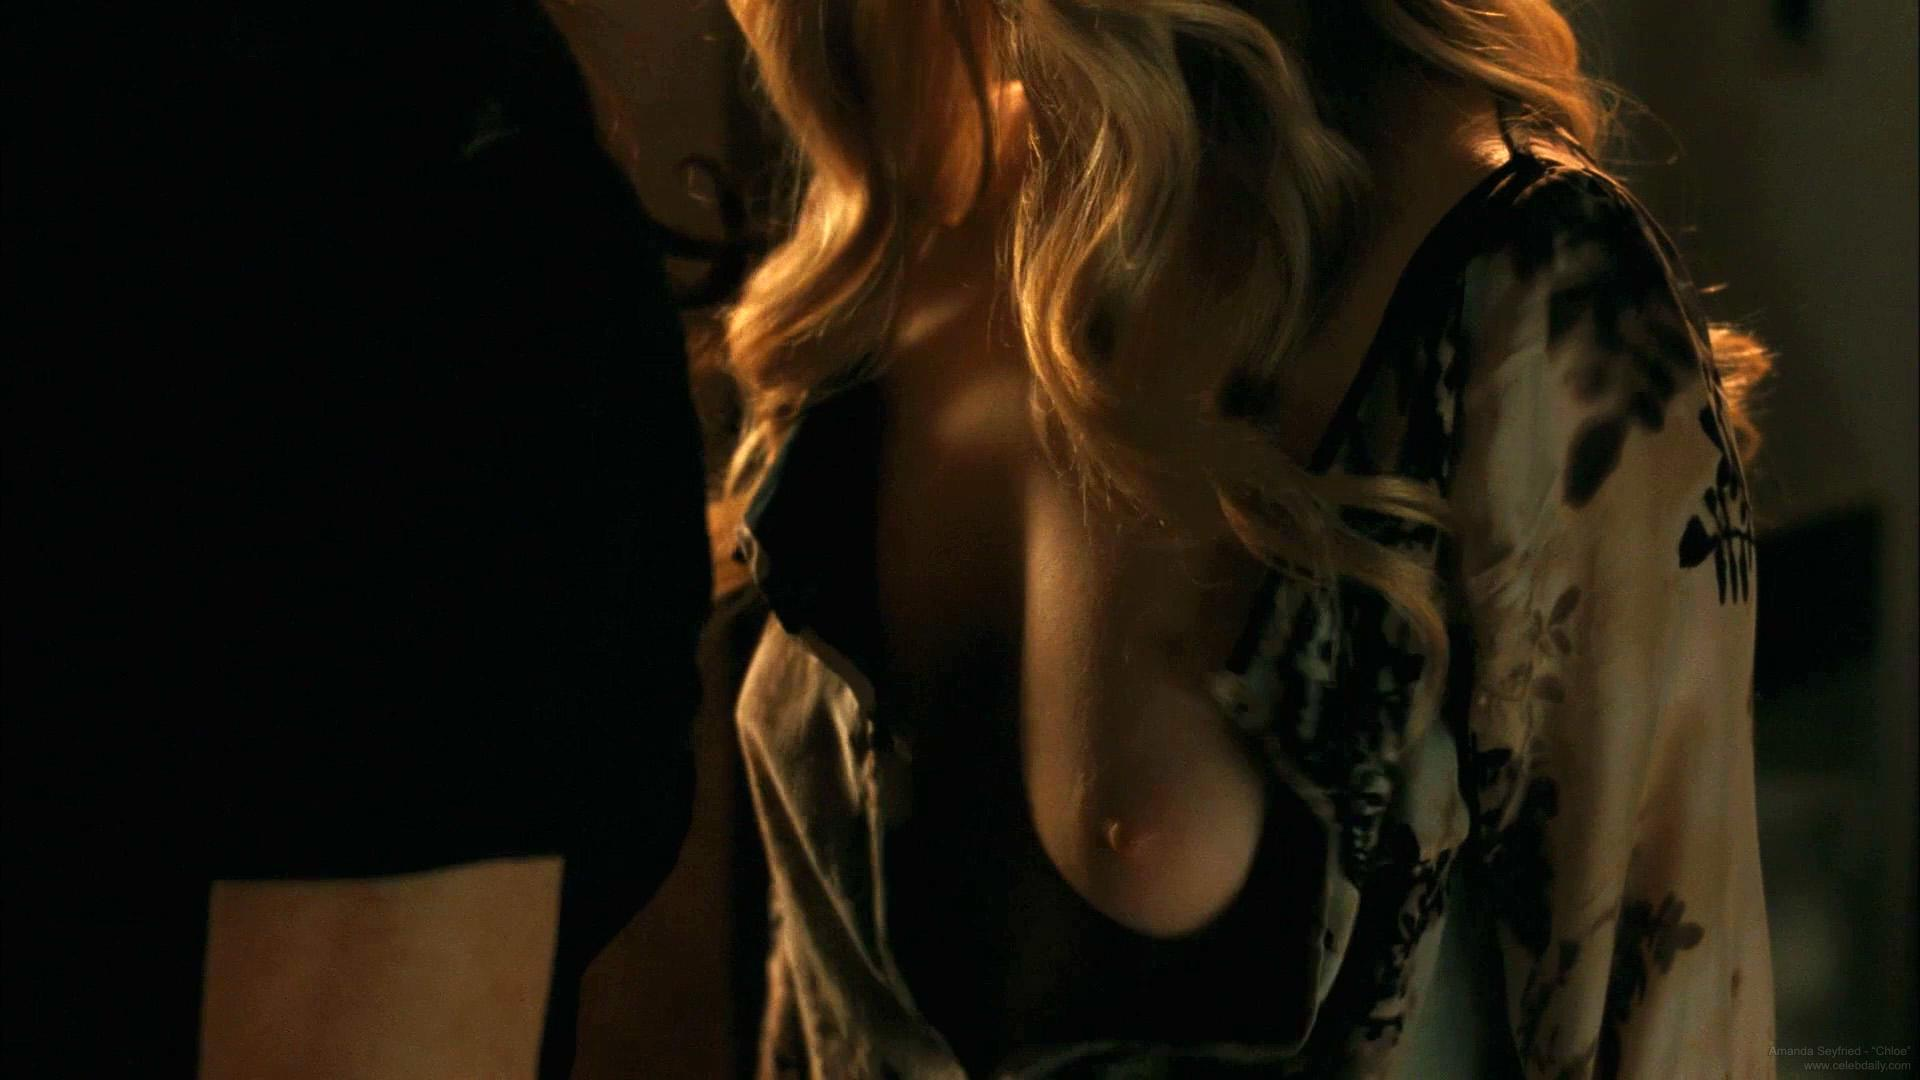 Amanda Seyfried fotos filtradas desnuda 3